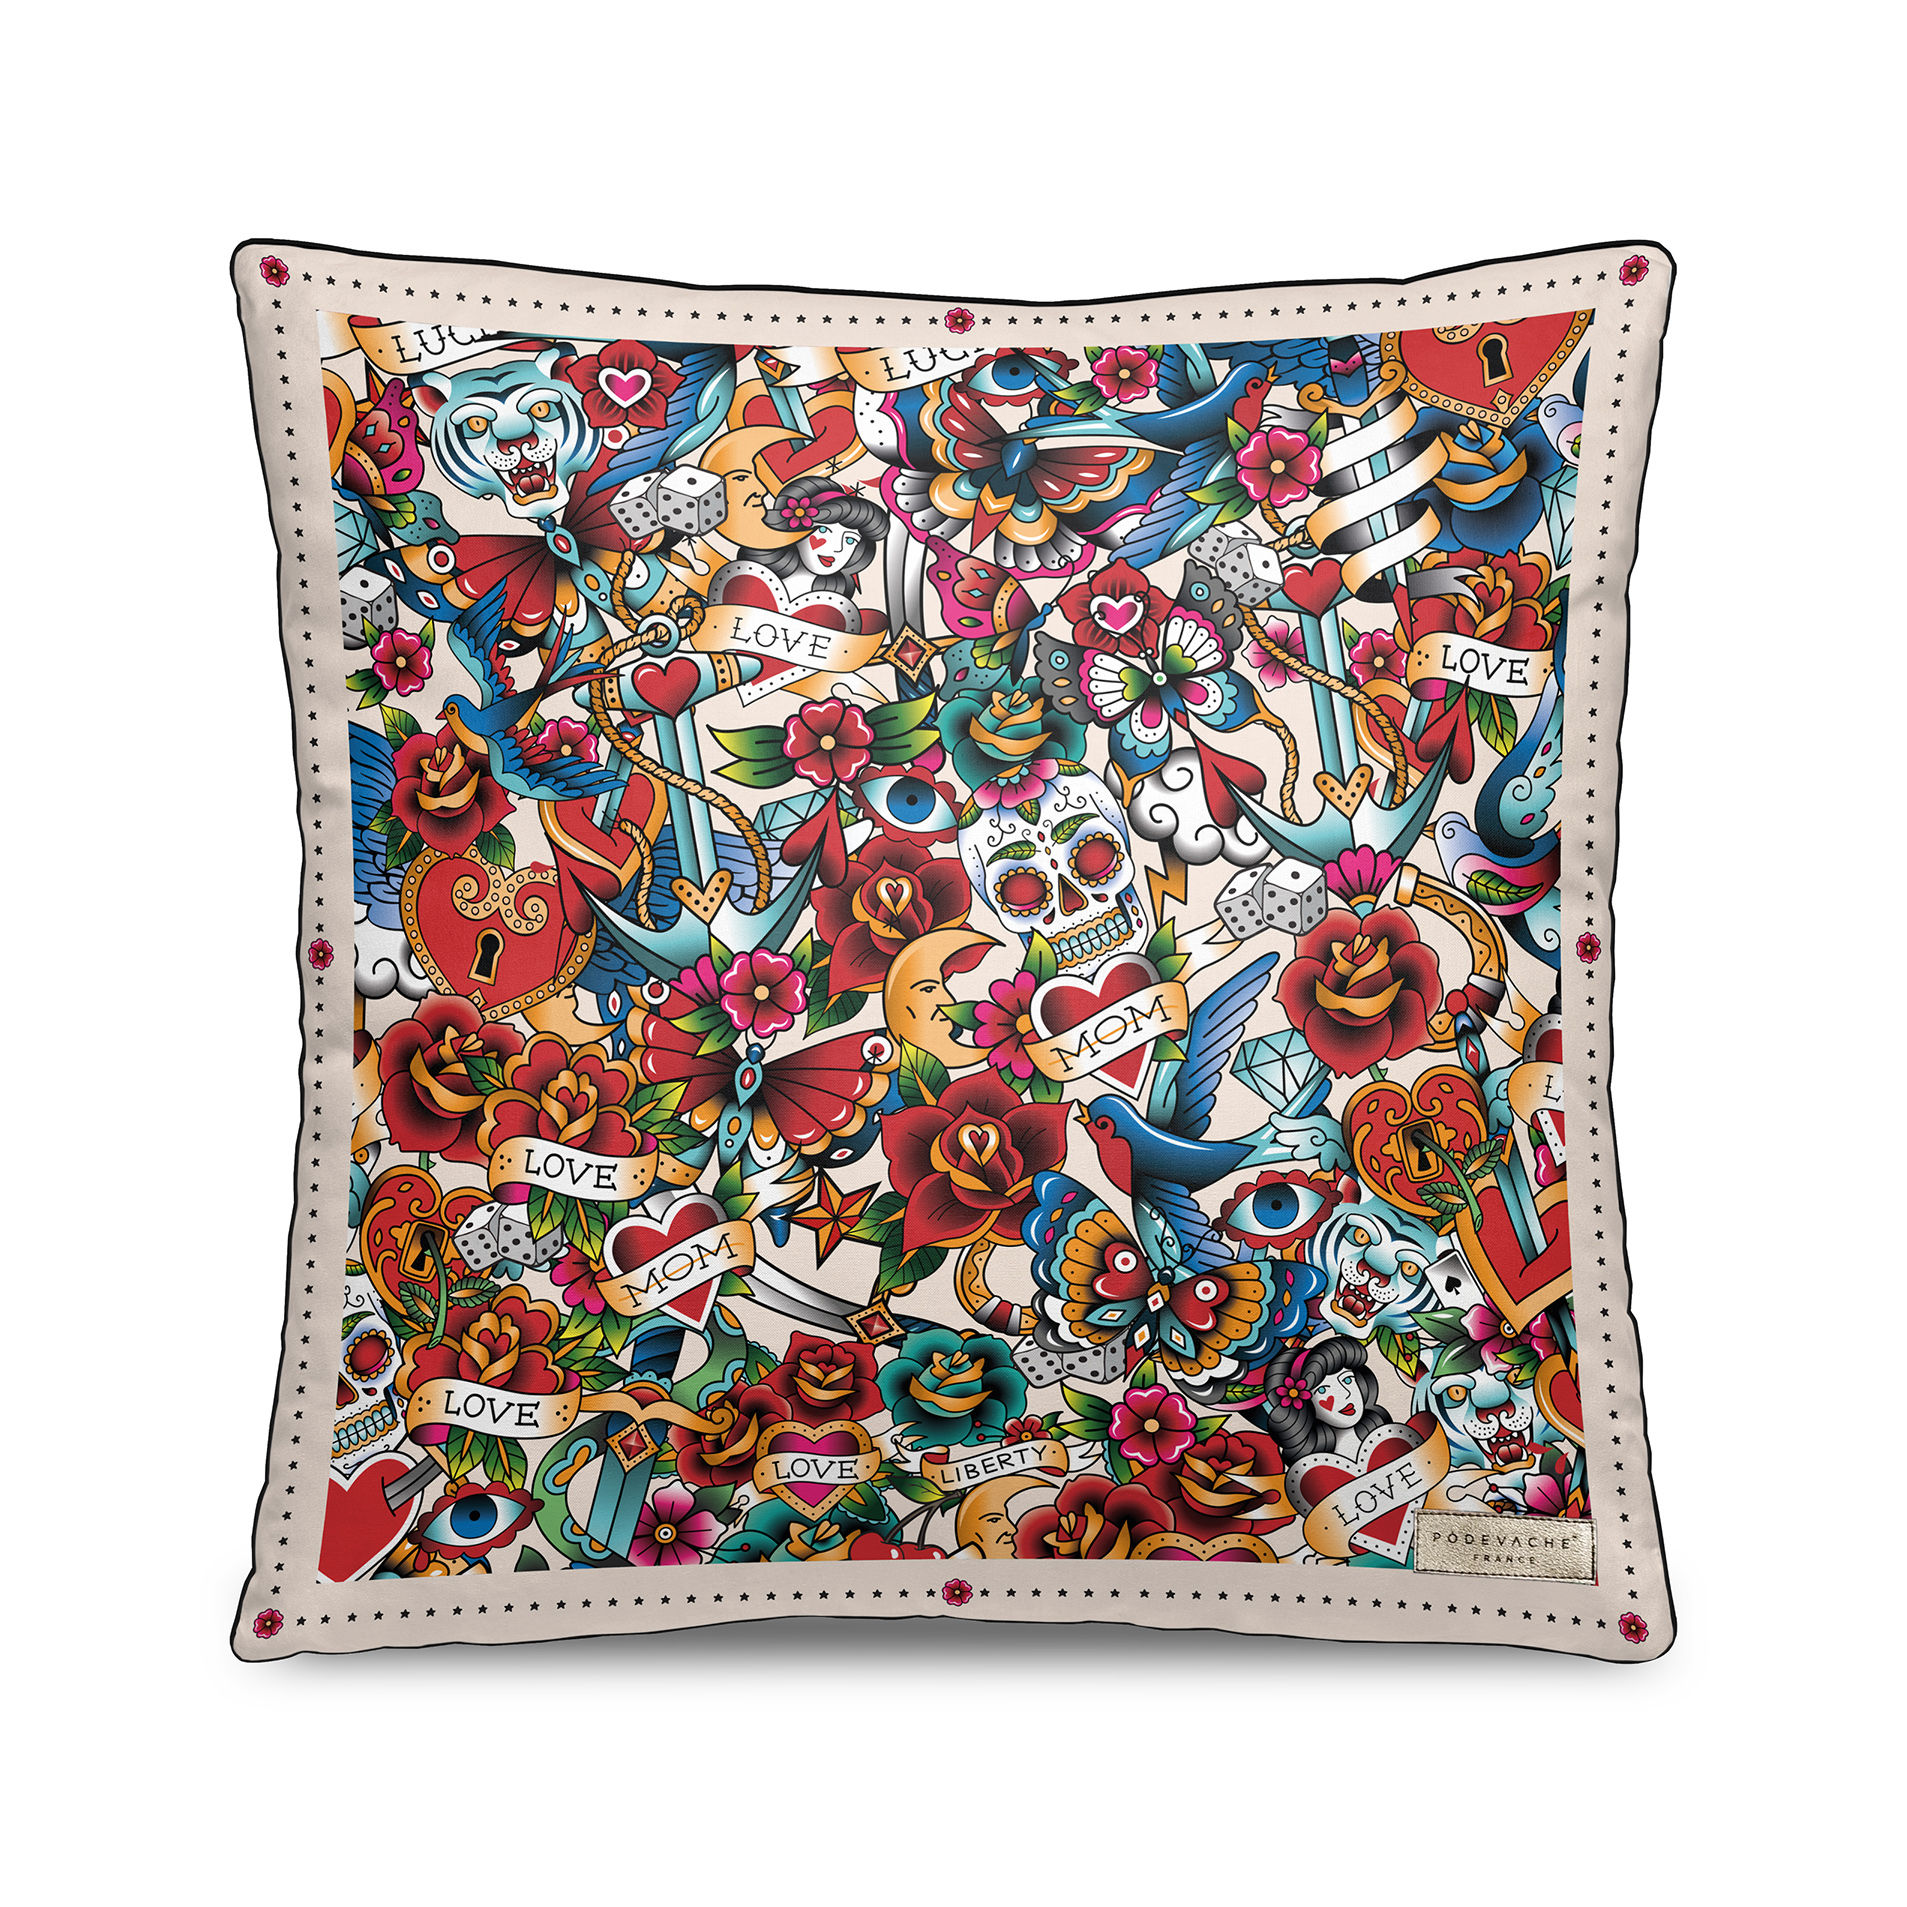 Déco - Coussins - Coussin Tatoo / Velours - 45 x 45 cm - PÔDEVACHE - Multi Tatoo / Multicolore - Polyester, Velours